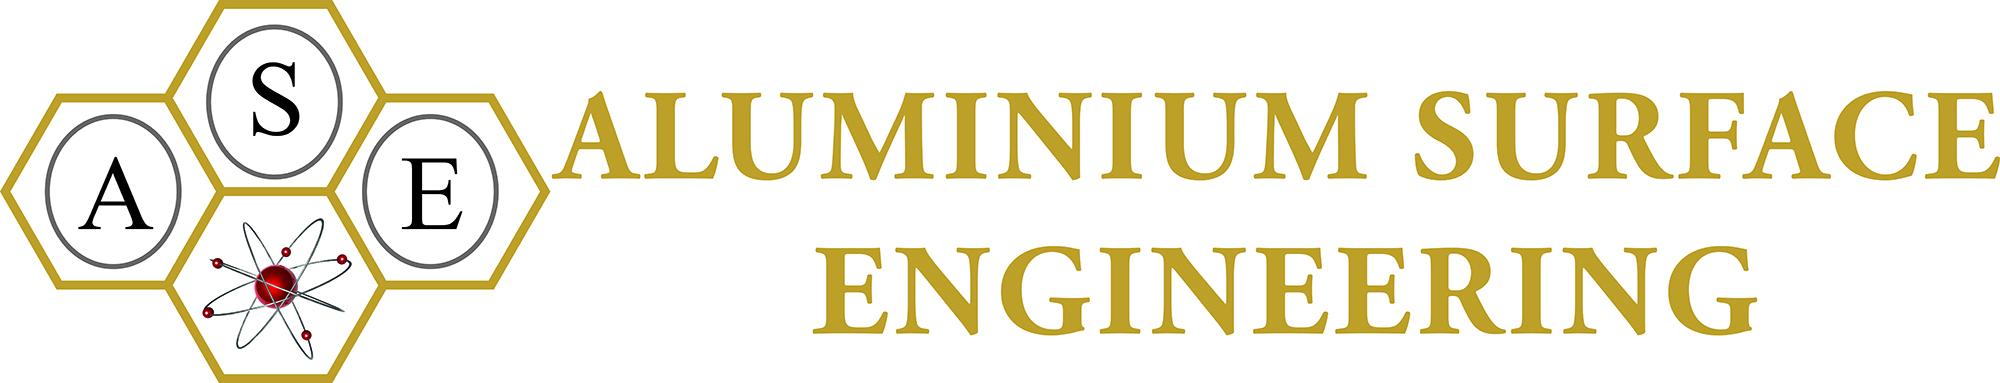 ASE logo WEB